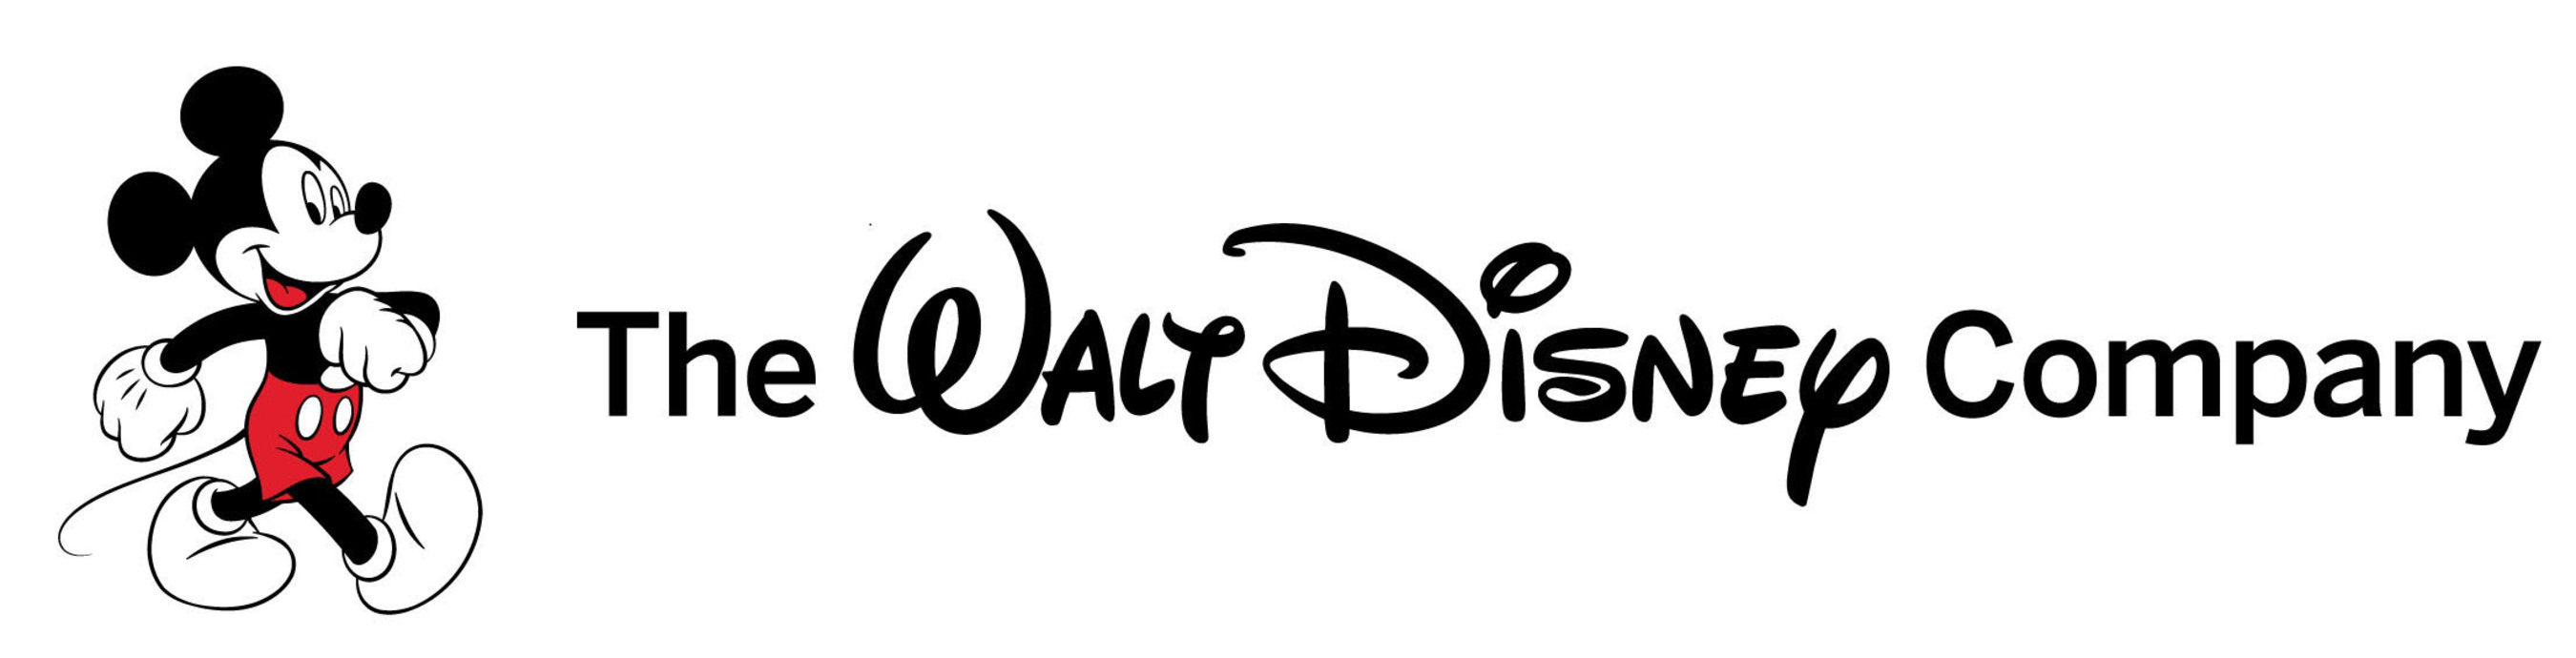 The Walt Disney Co. logo. (PRNewsFoto/Netflix, Inc.) (PRNewsFoto/NETFLIX, INC.)